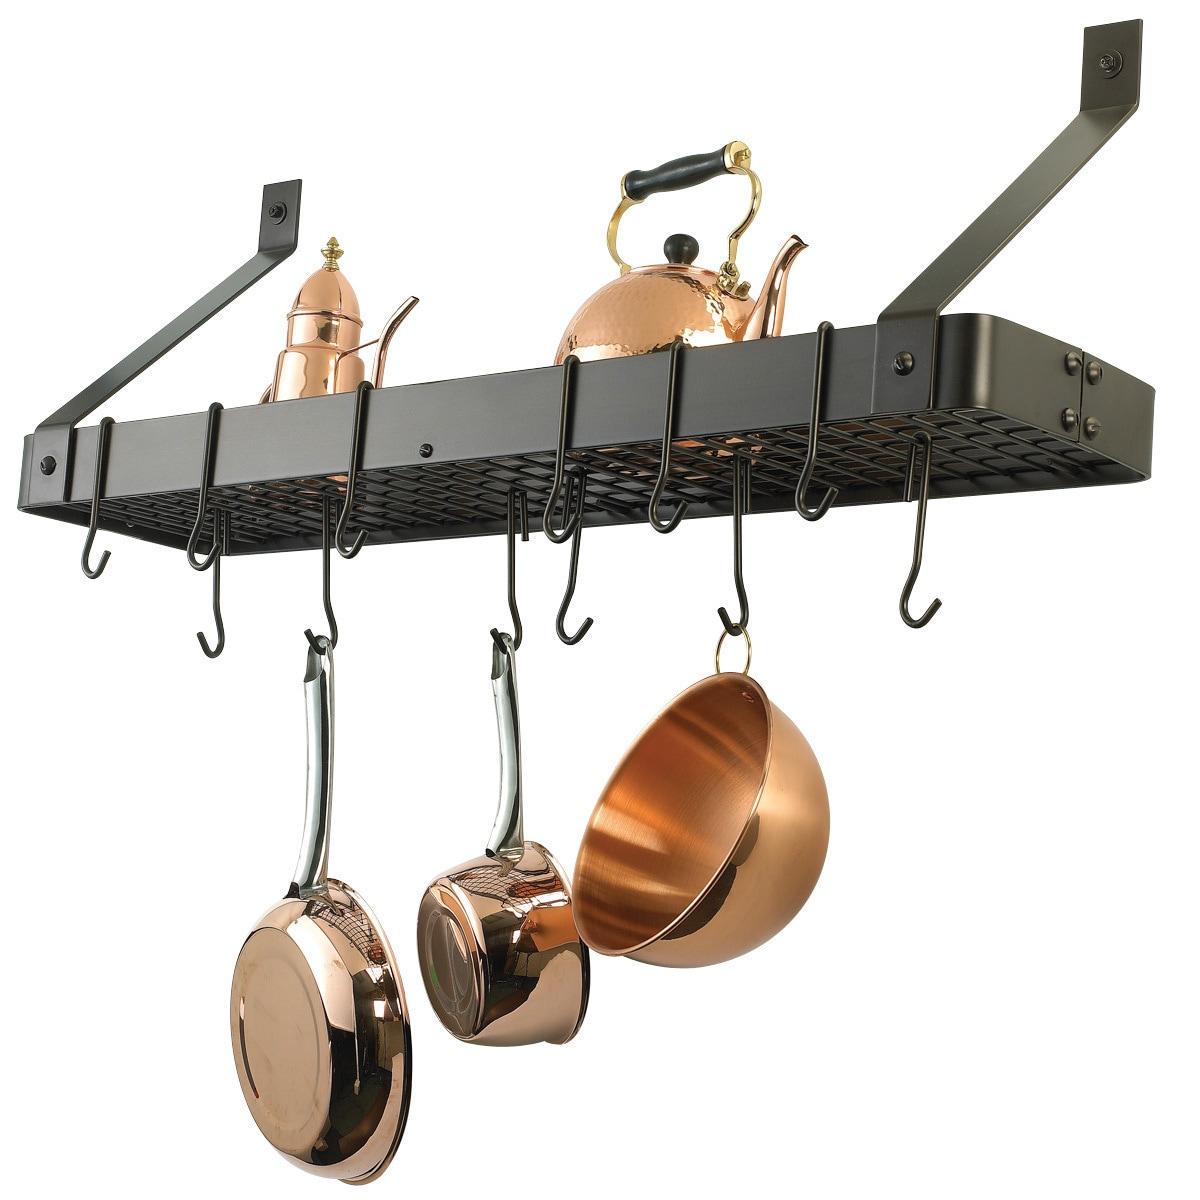 Kitchen, Dining & Bar 20 Pack Heavy Duty Kitchen Utensils Cookware Pot & Pan Rack Hanging Hooks Black Home & Garden